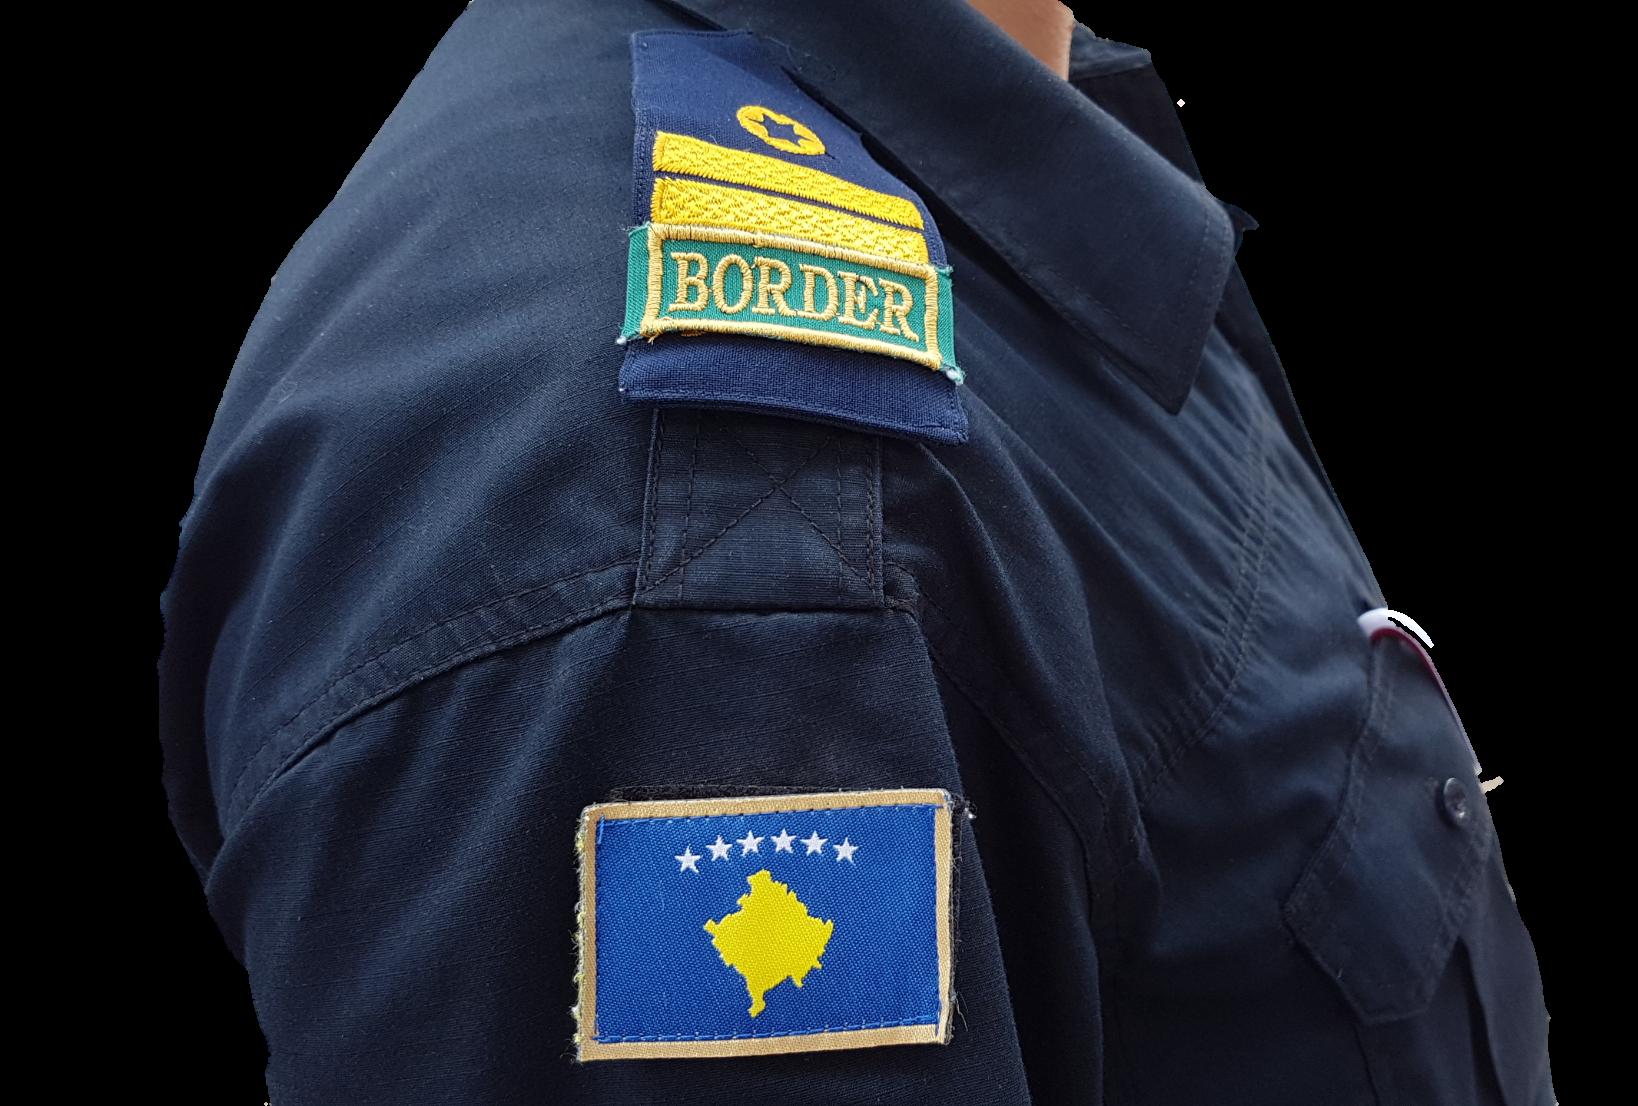 Pogranična policija